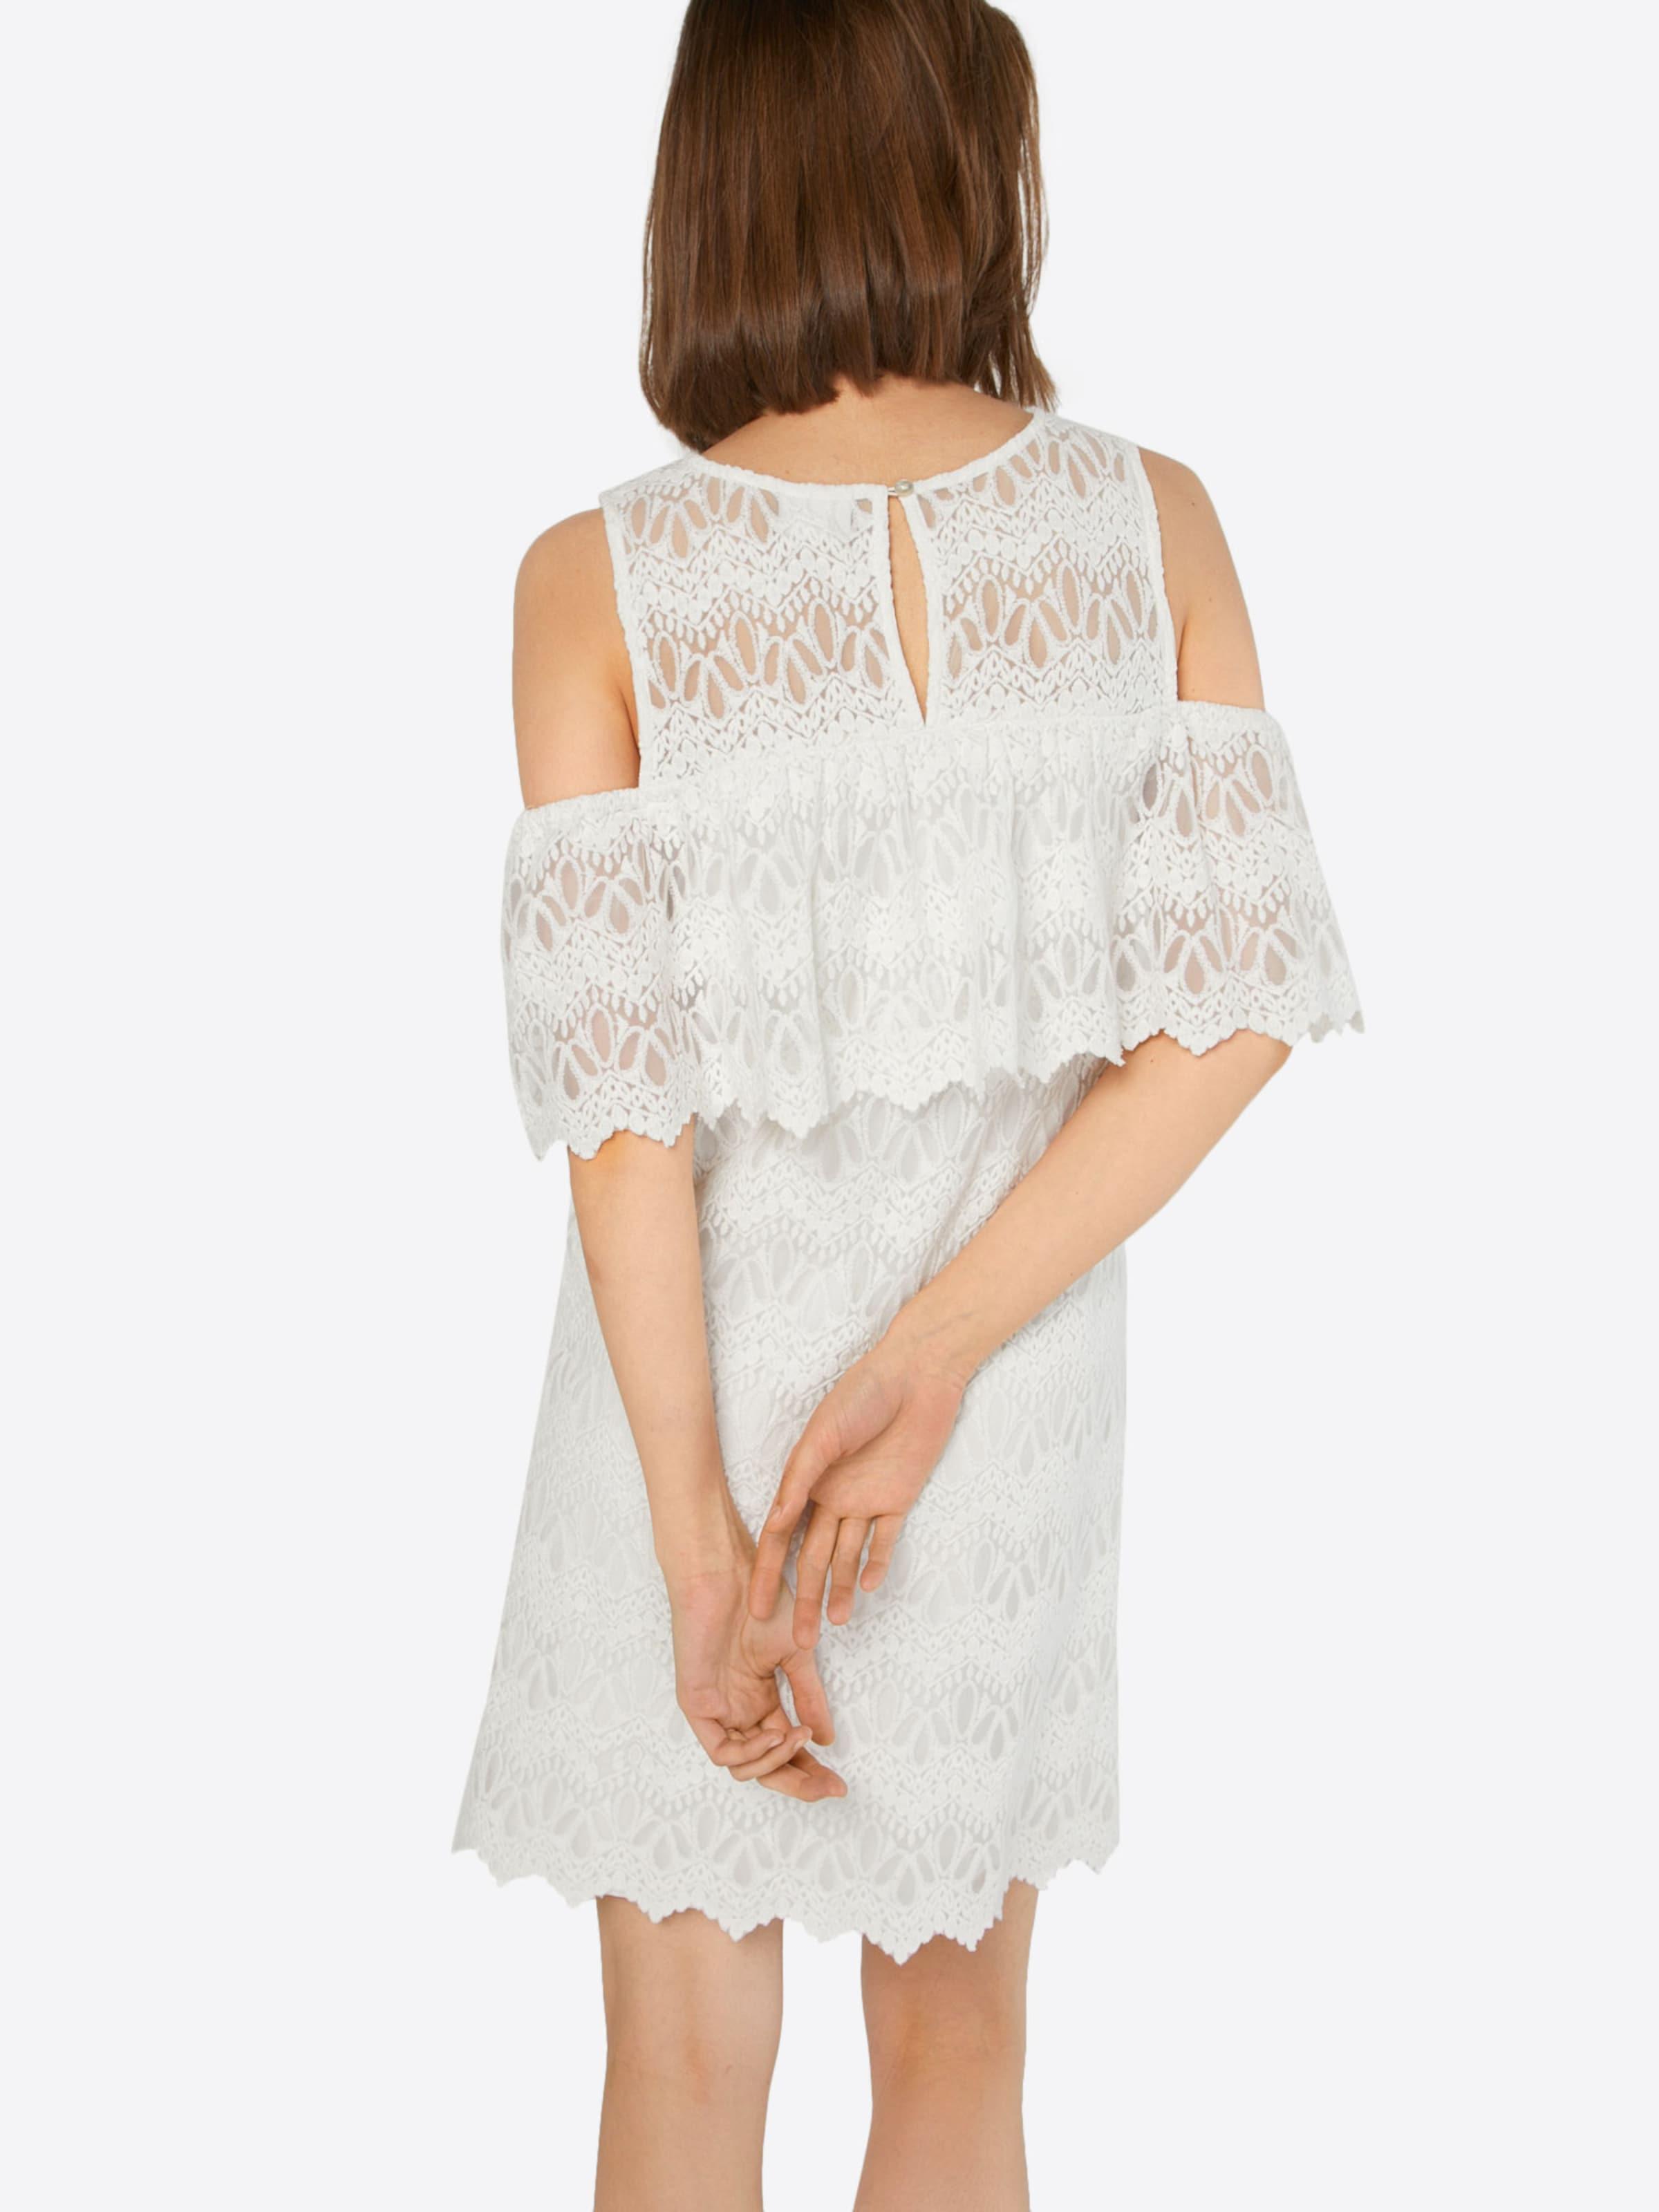 Kleid Cold In Vila Shoulder Weiß yvYfIg6b7m